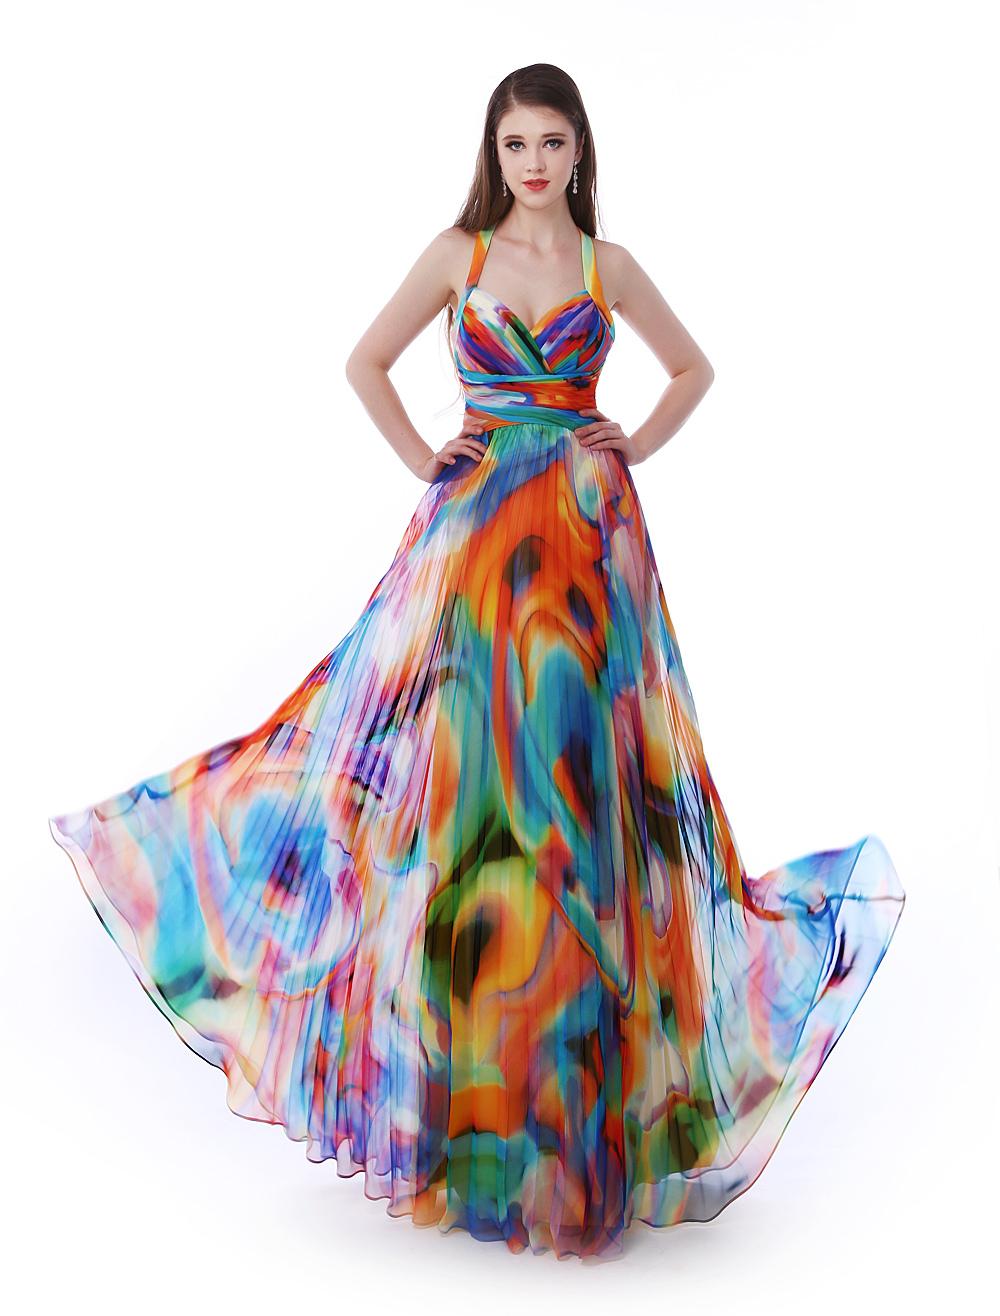 Milanoo / Long Prom Dresses 2017 African Print Prom Dress Halter Floral Print Cross Back Chiffon Party Dress M